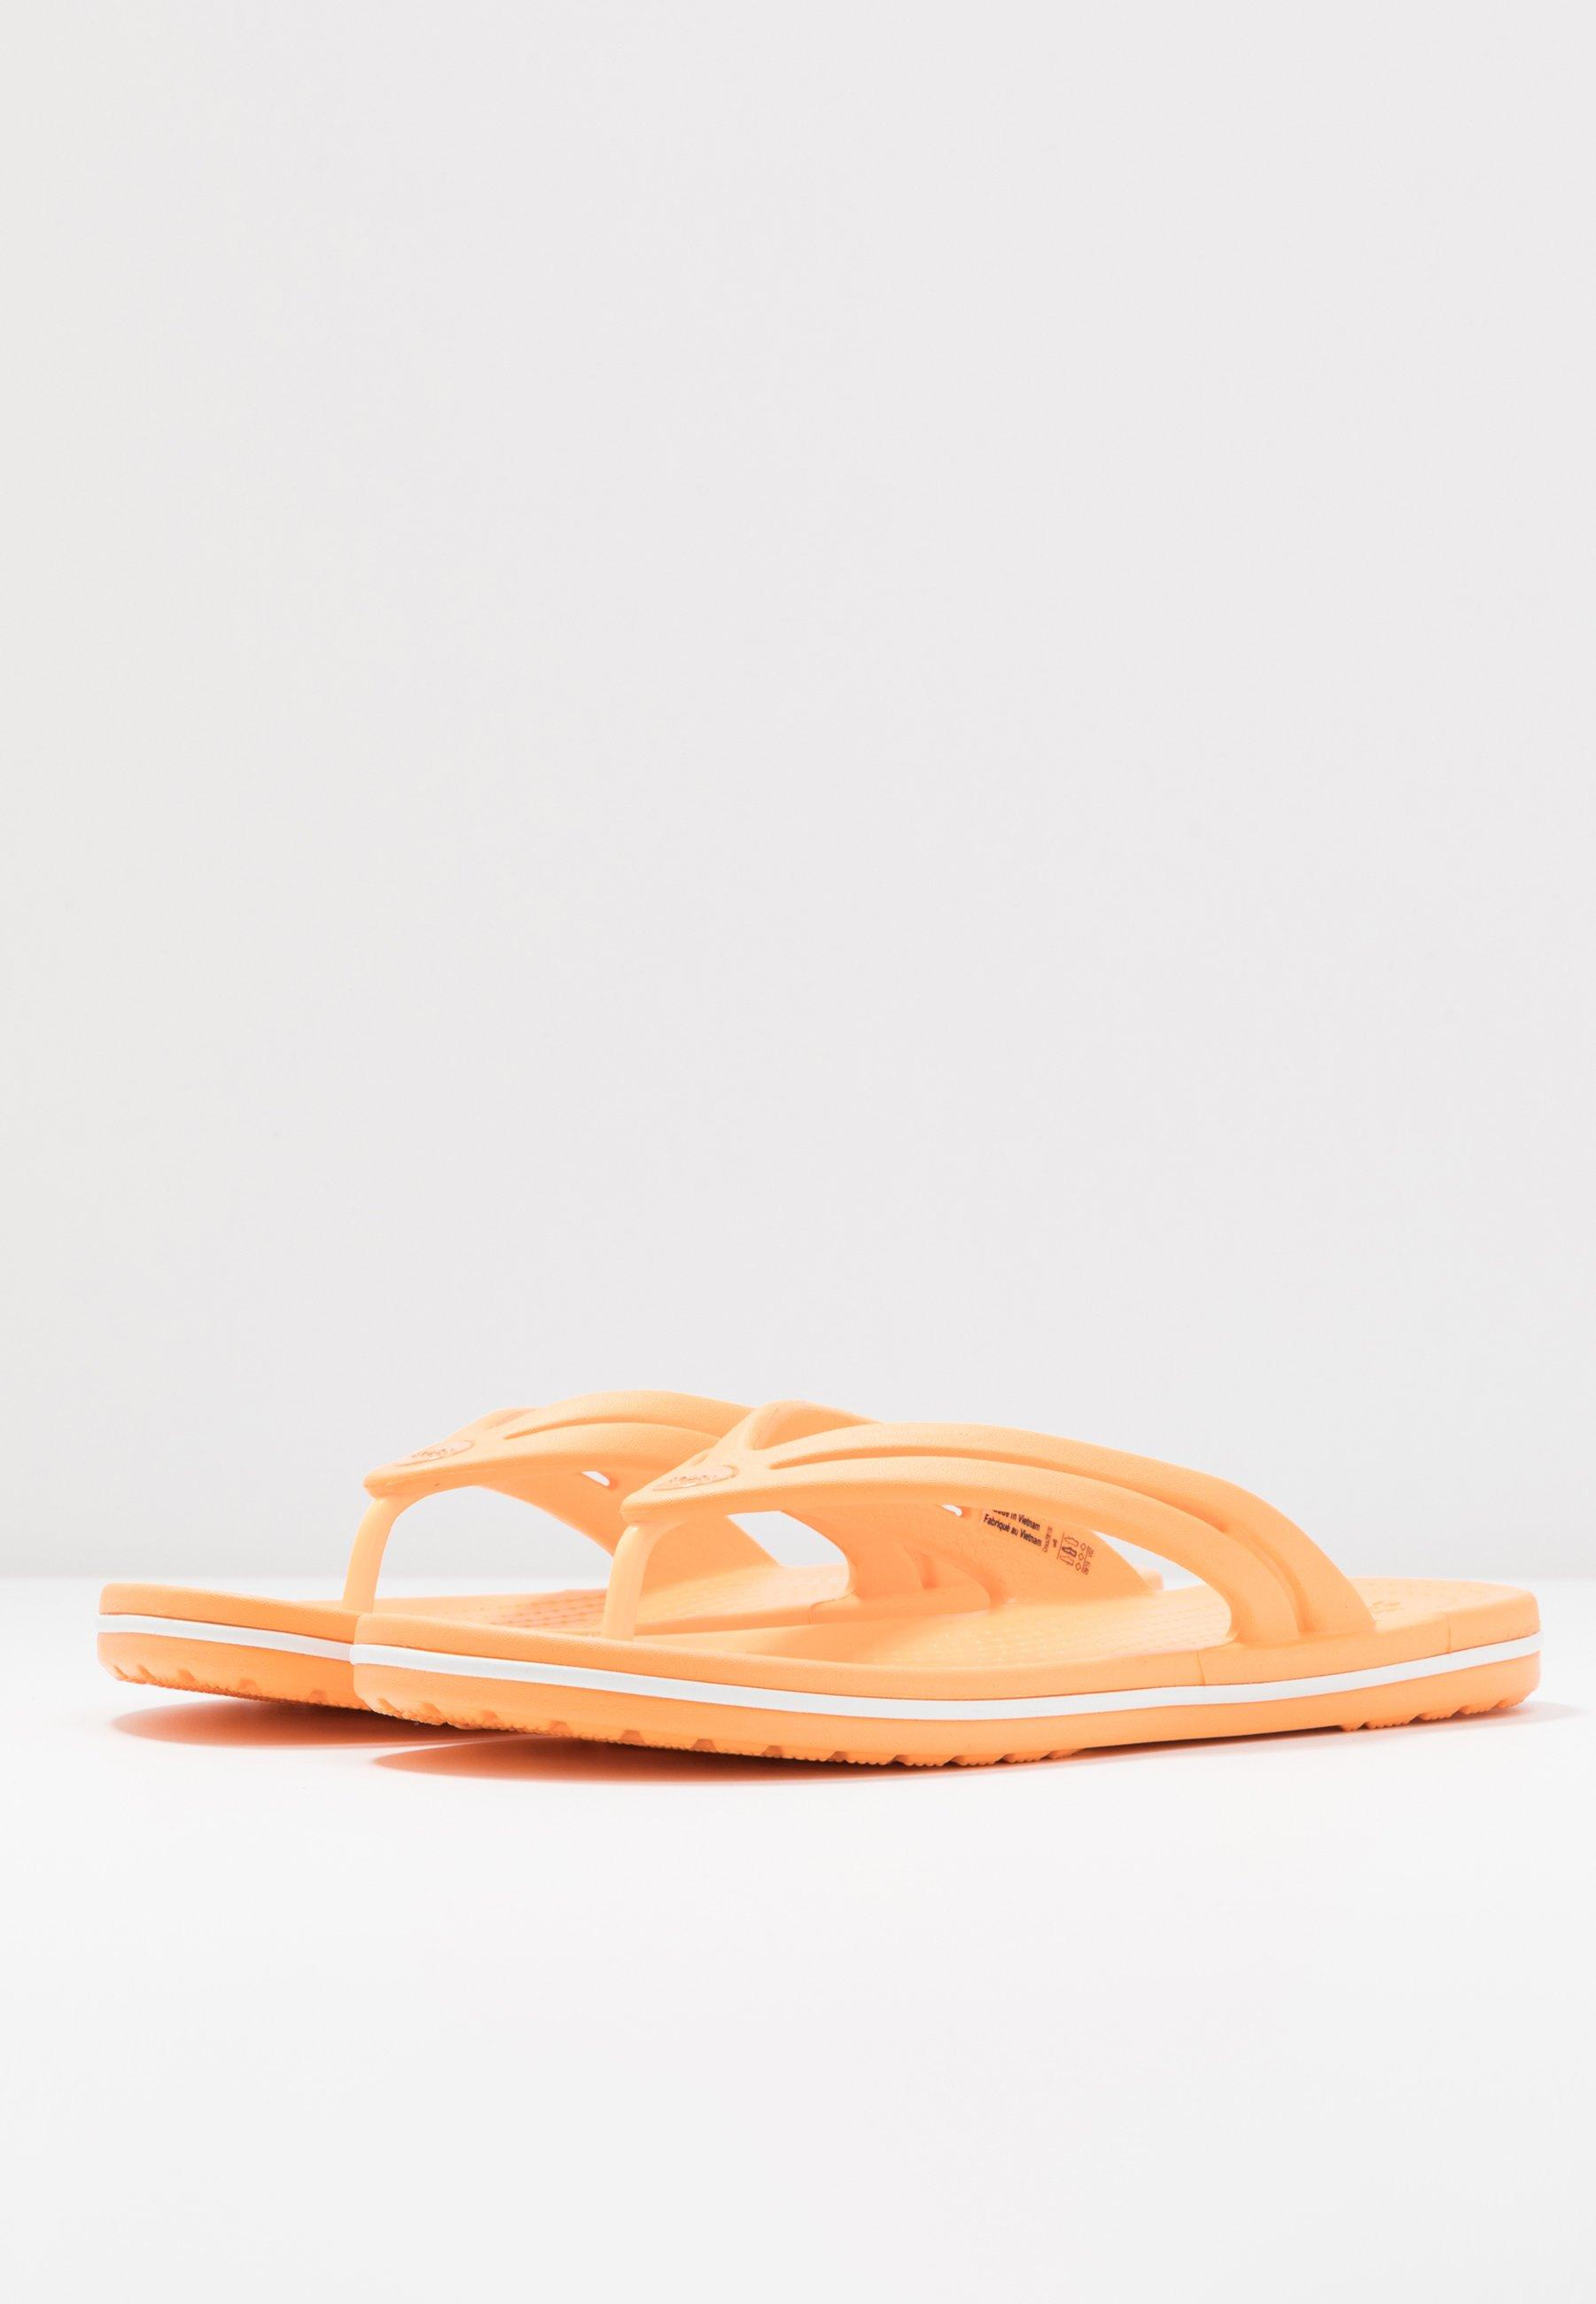 Crocs Crocband - Klipklappere/ Klip Klapper Cantaloupe